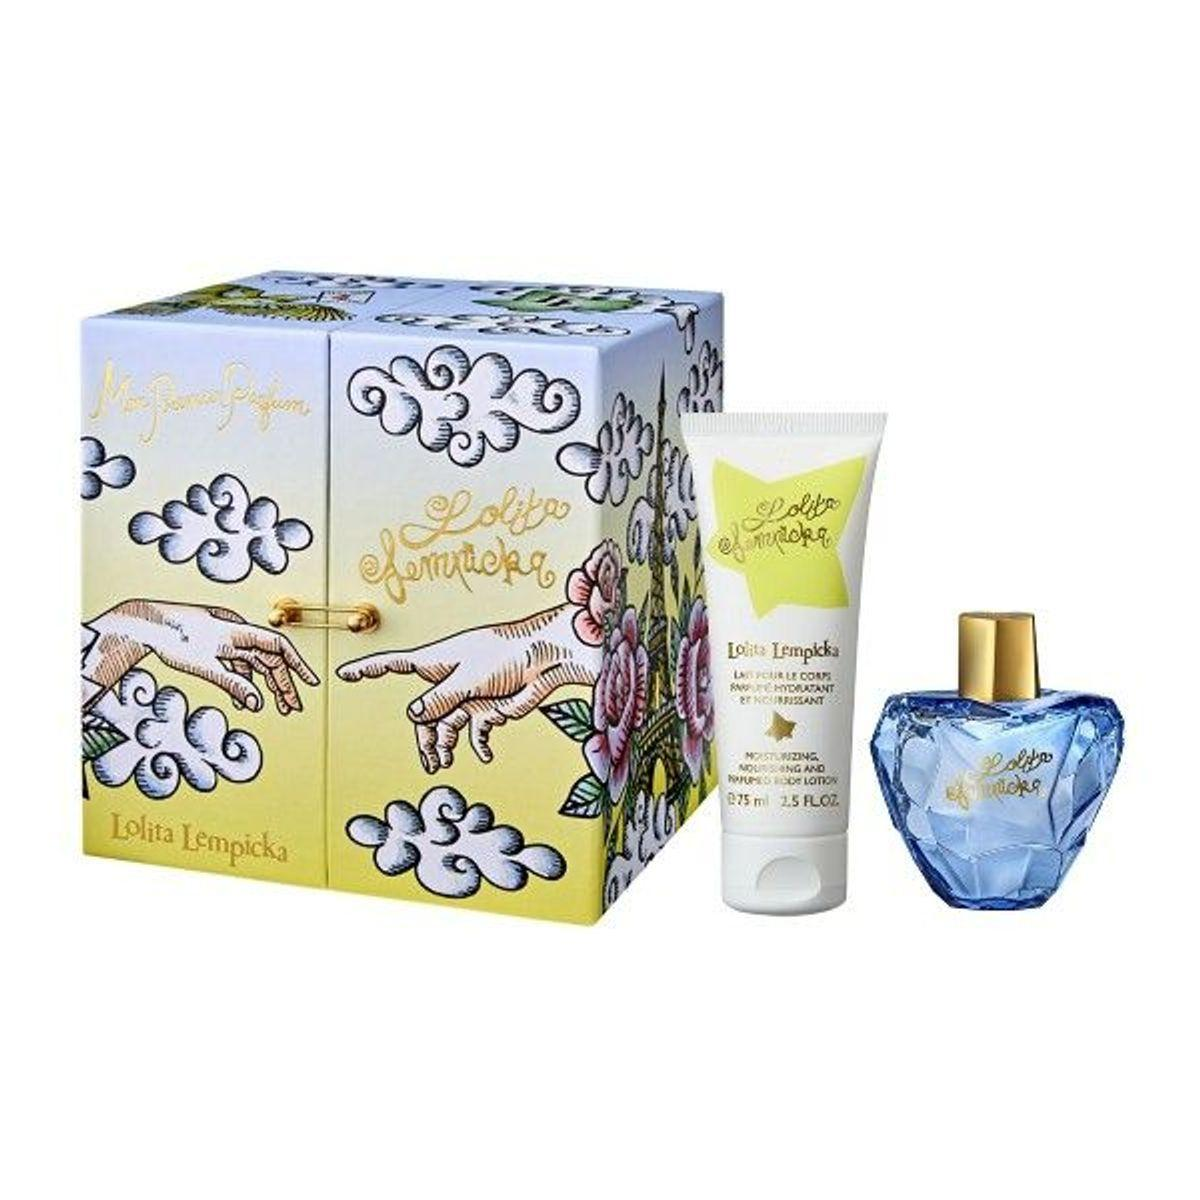 Lolita Lempicka Mon Premier Gift Set edp 50ml+ body lotion 75ml